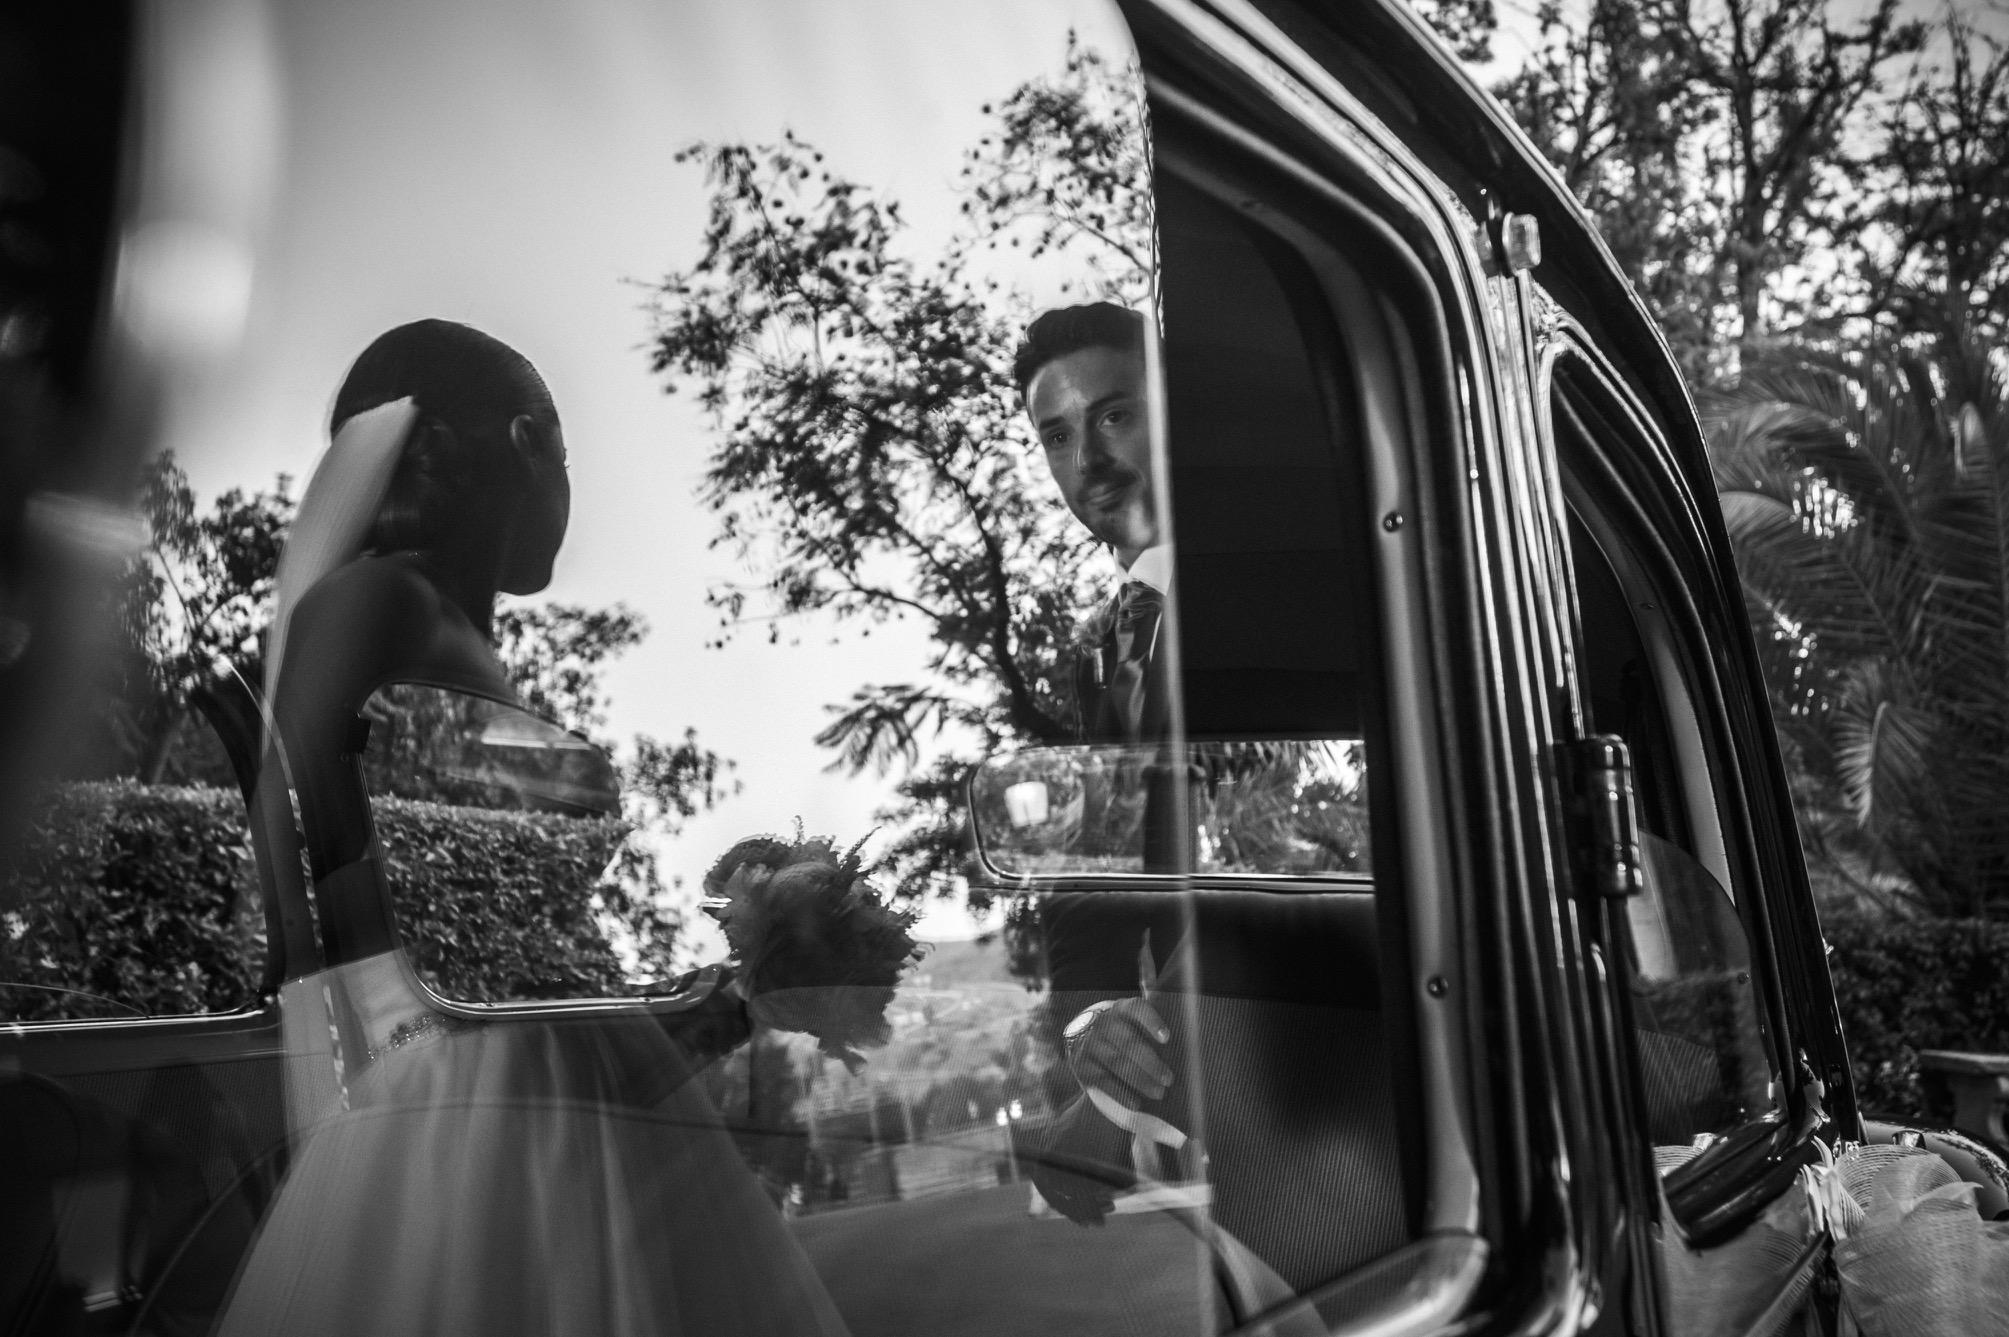 Si-Quiero-Wedding-Planner-By-Sira-Antequera-Virginia-Jose-20